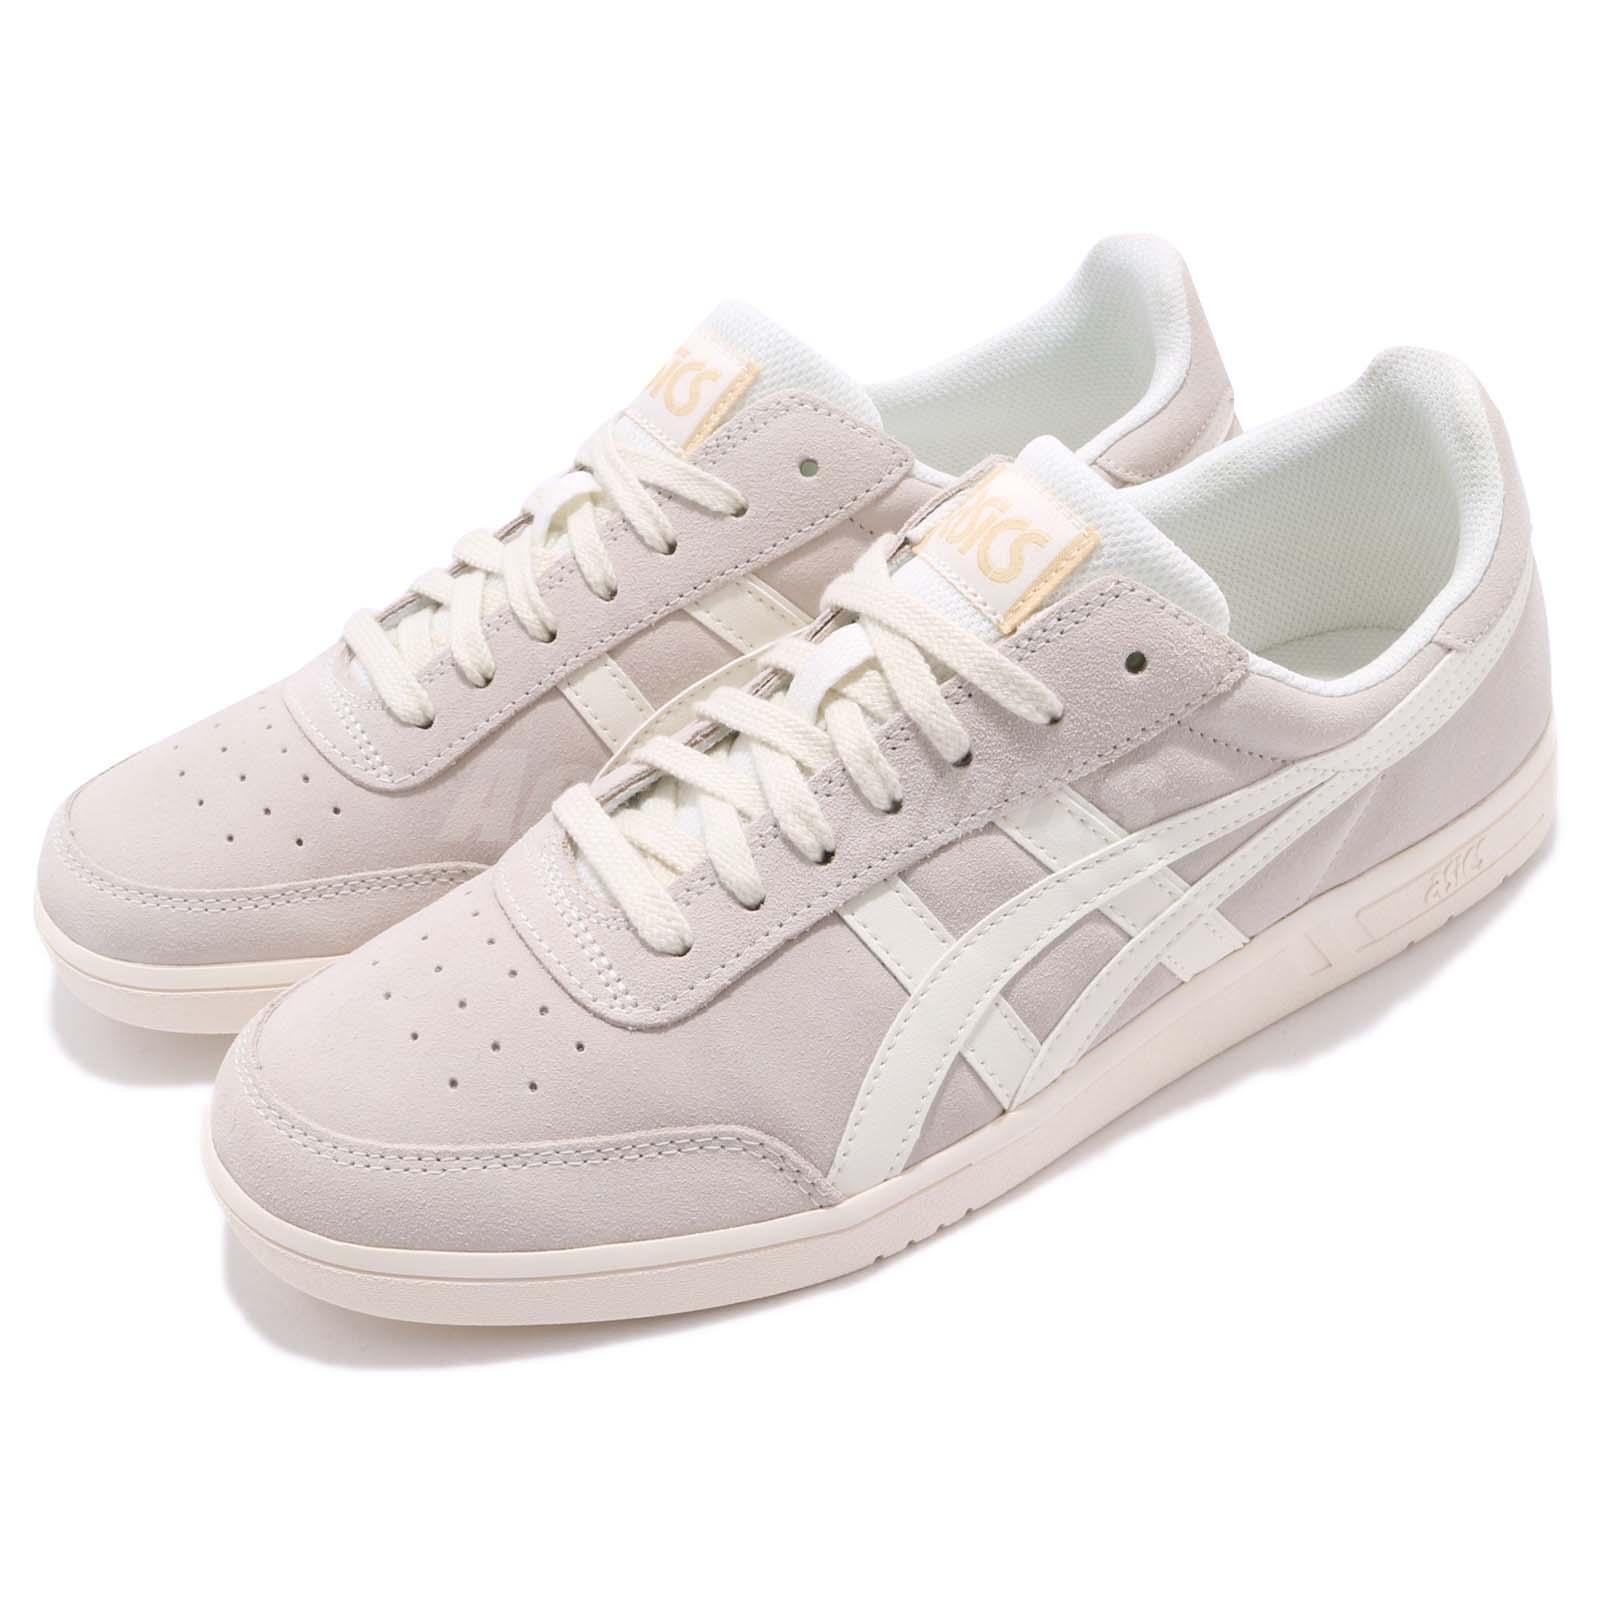 91b633ce8fda0 Details about Asics Tiger Gel-Vickka TRS Cream Ivory Vintage Men Shoes  Sneakers H847L-0000